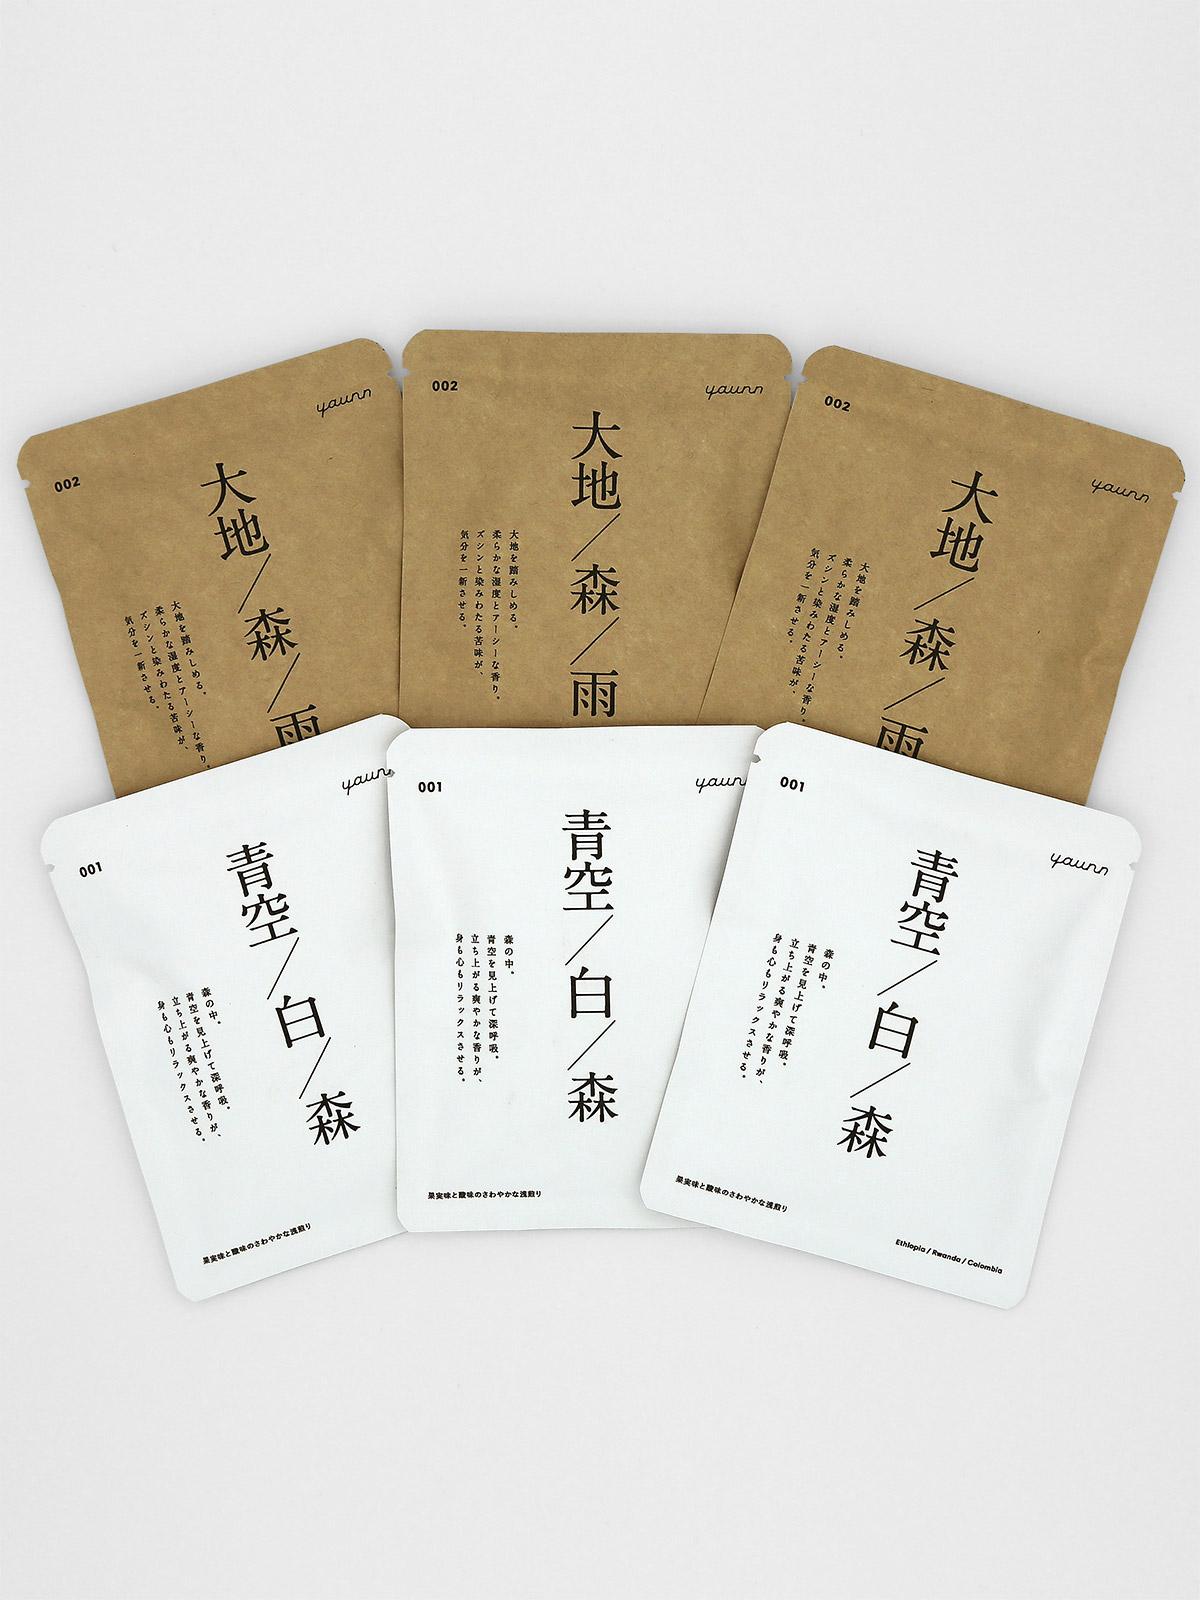 yaunn 珈琲ドリップバッグ 森の青空と大地セット 6pcs Roasted by 軽井沢コーヒーカンパニー